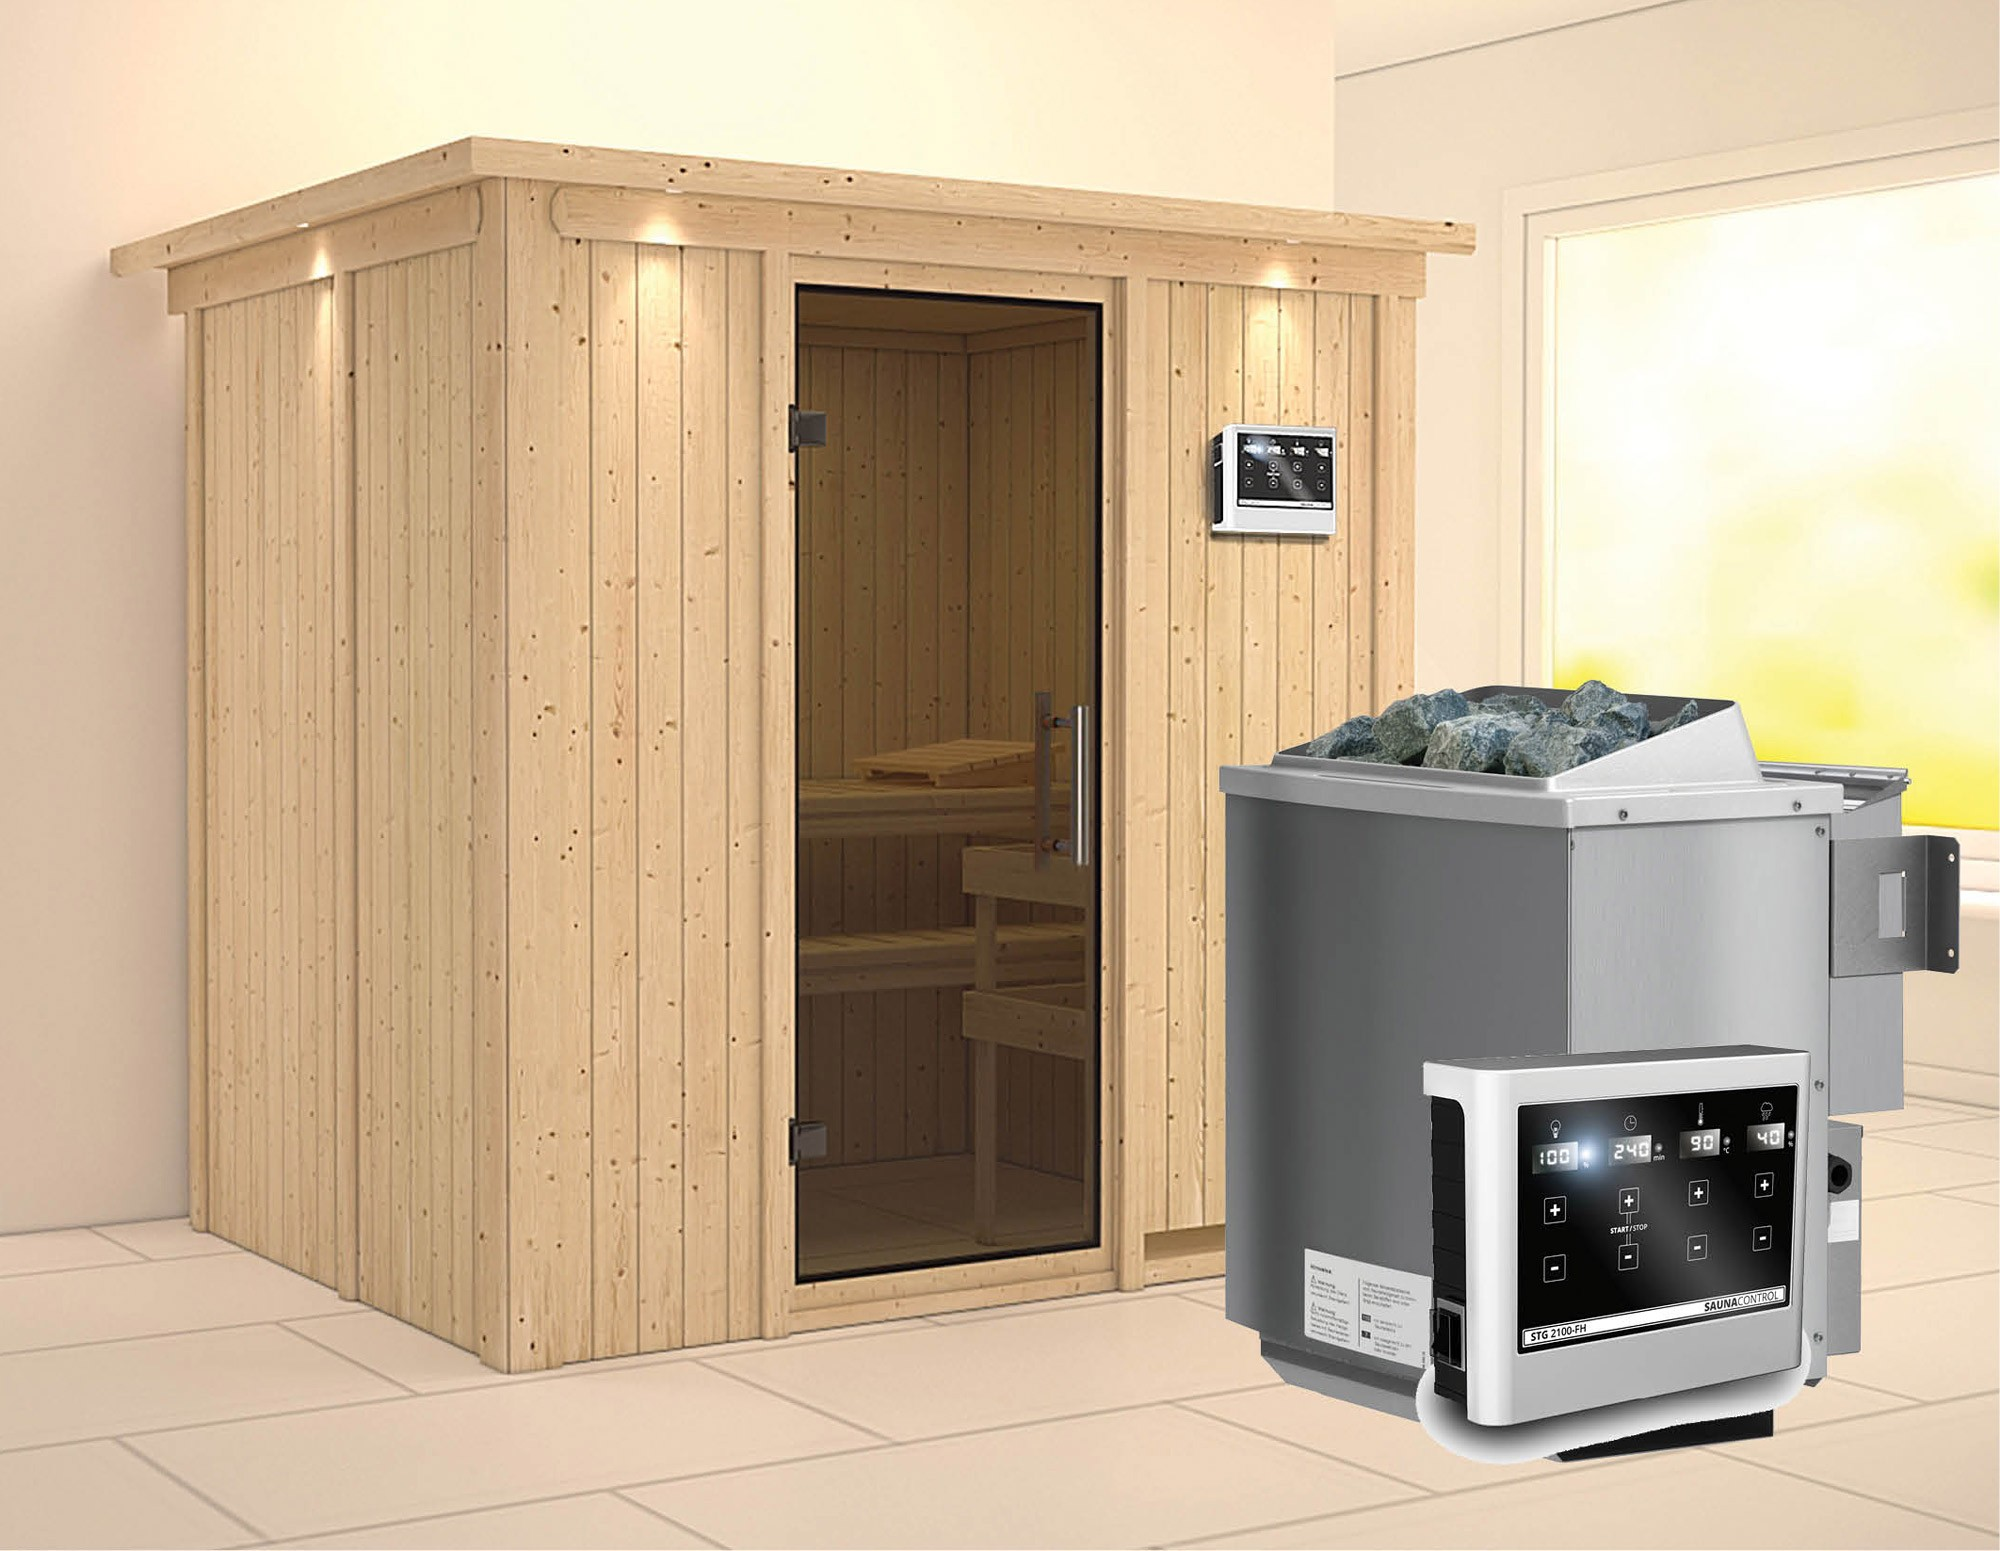 Karibu Sauna Bodin 68mm Dachkranz Bio Saunaofen 9kW extern moderne Tür Bild 1